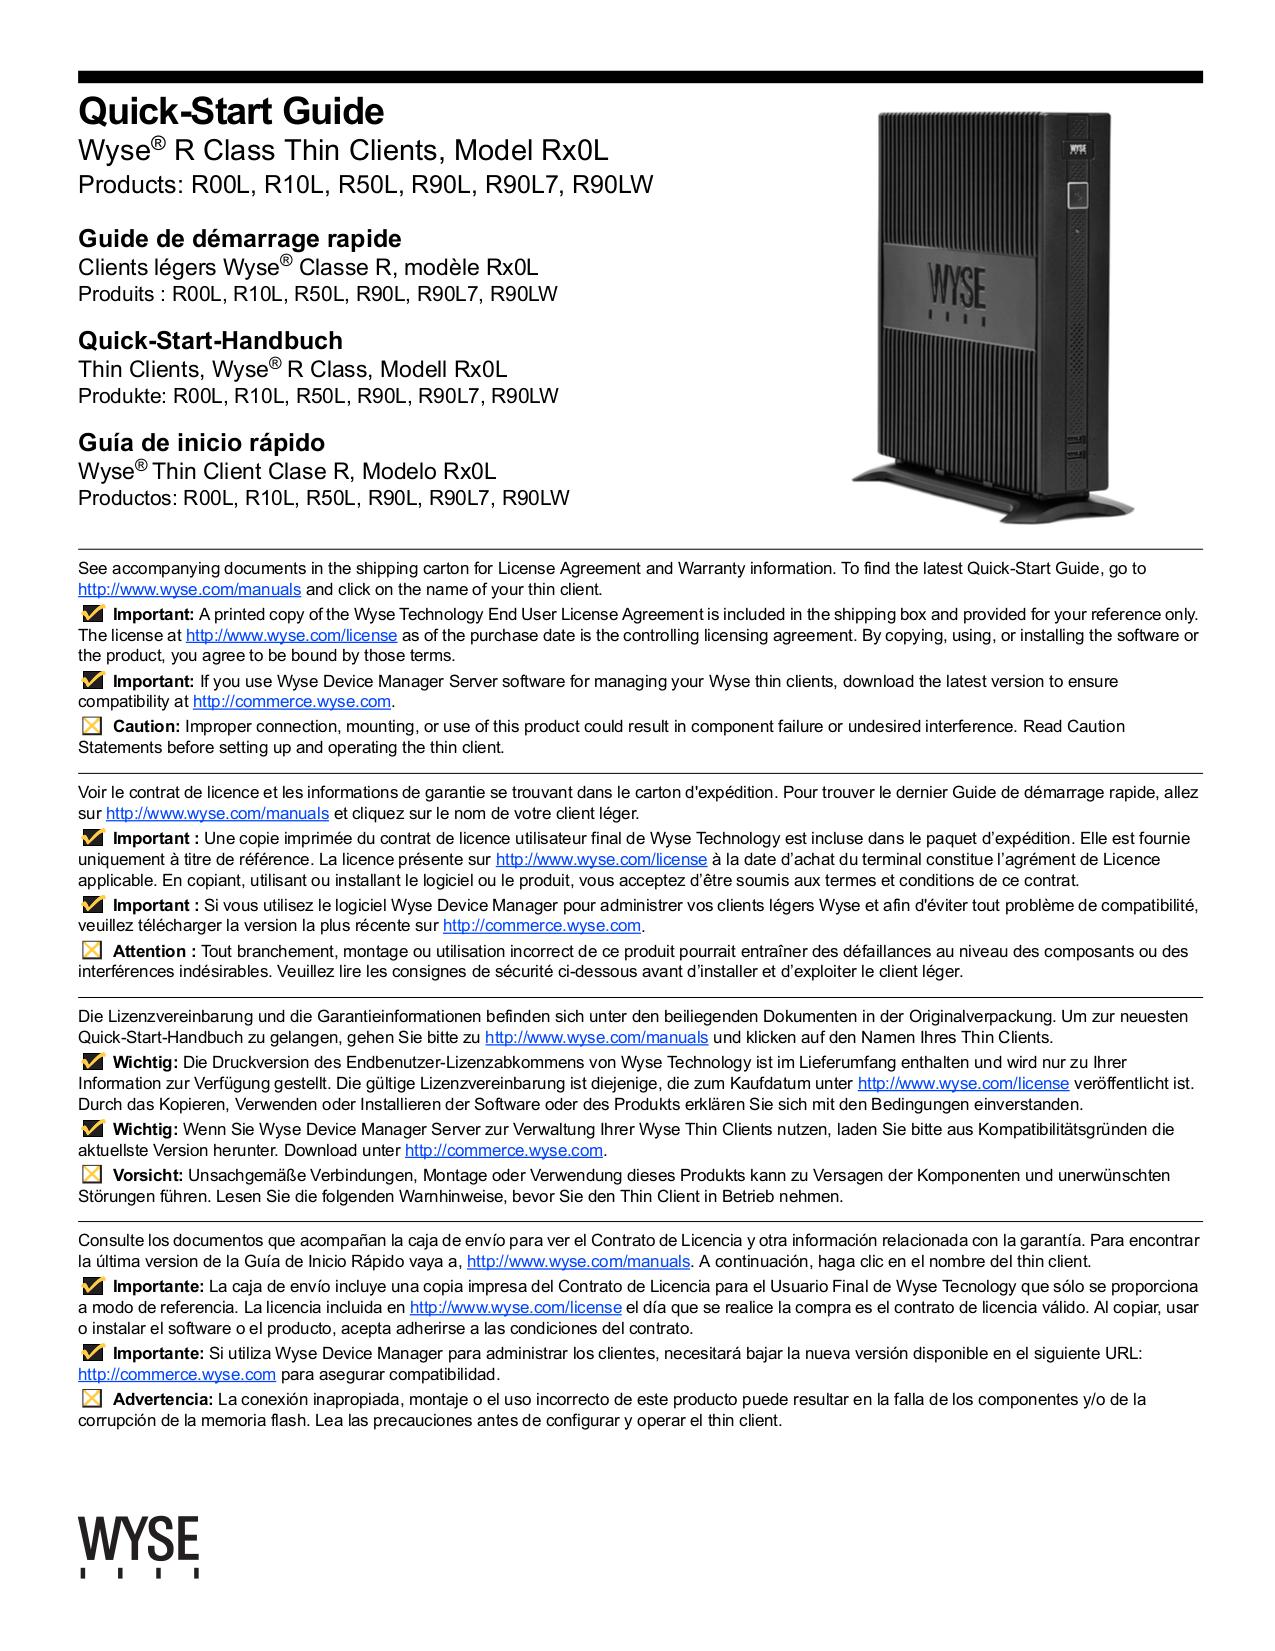 pdf for Wyse Desktop R50L manual